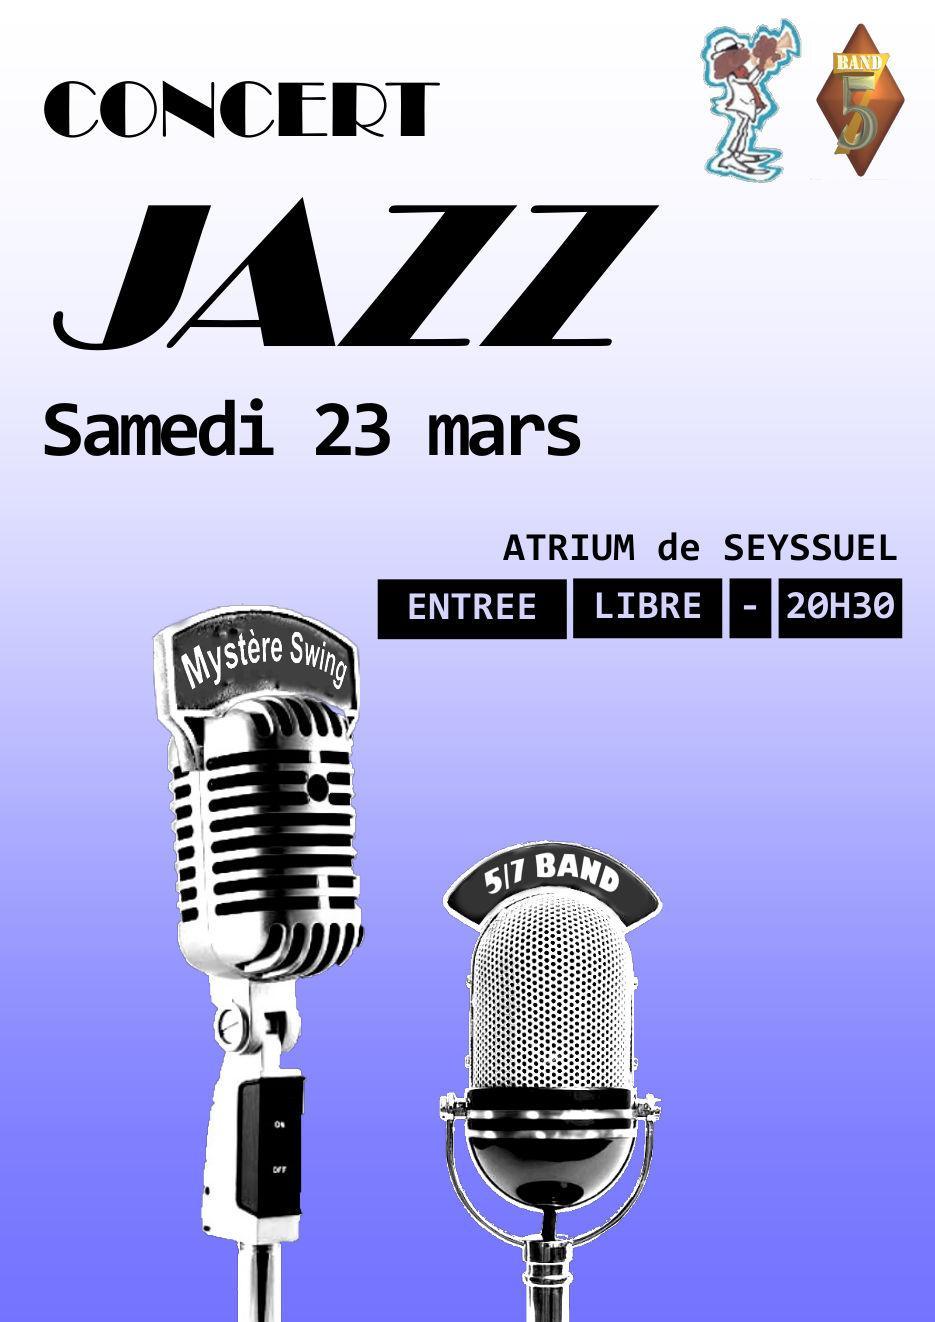 Concert 5/7 Band Seyssuel 23 mars 2019